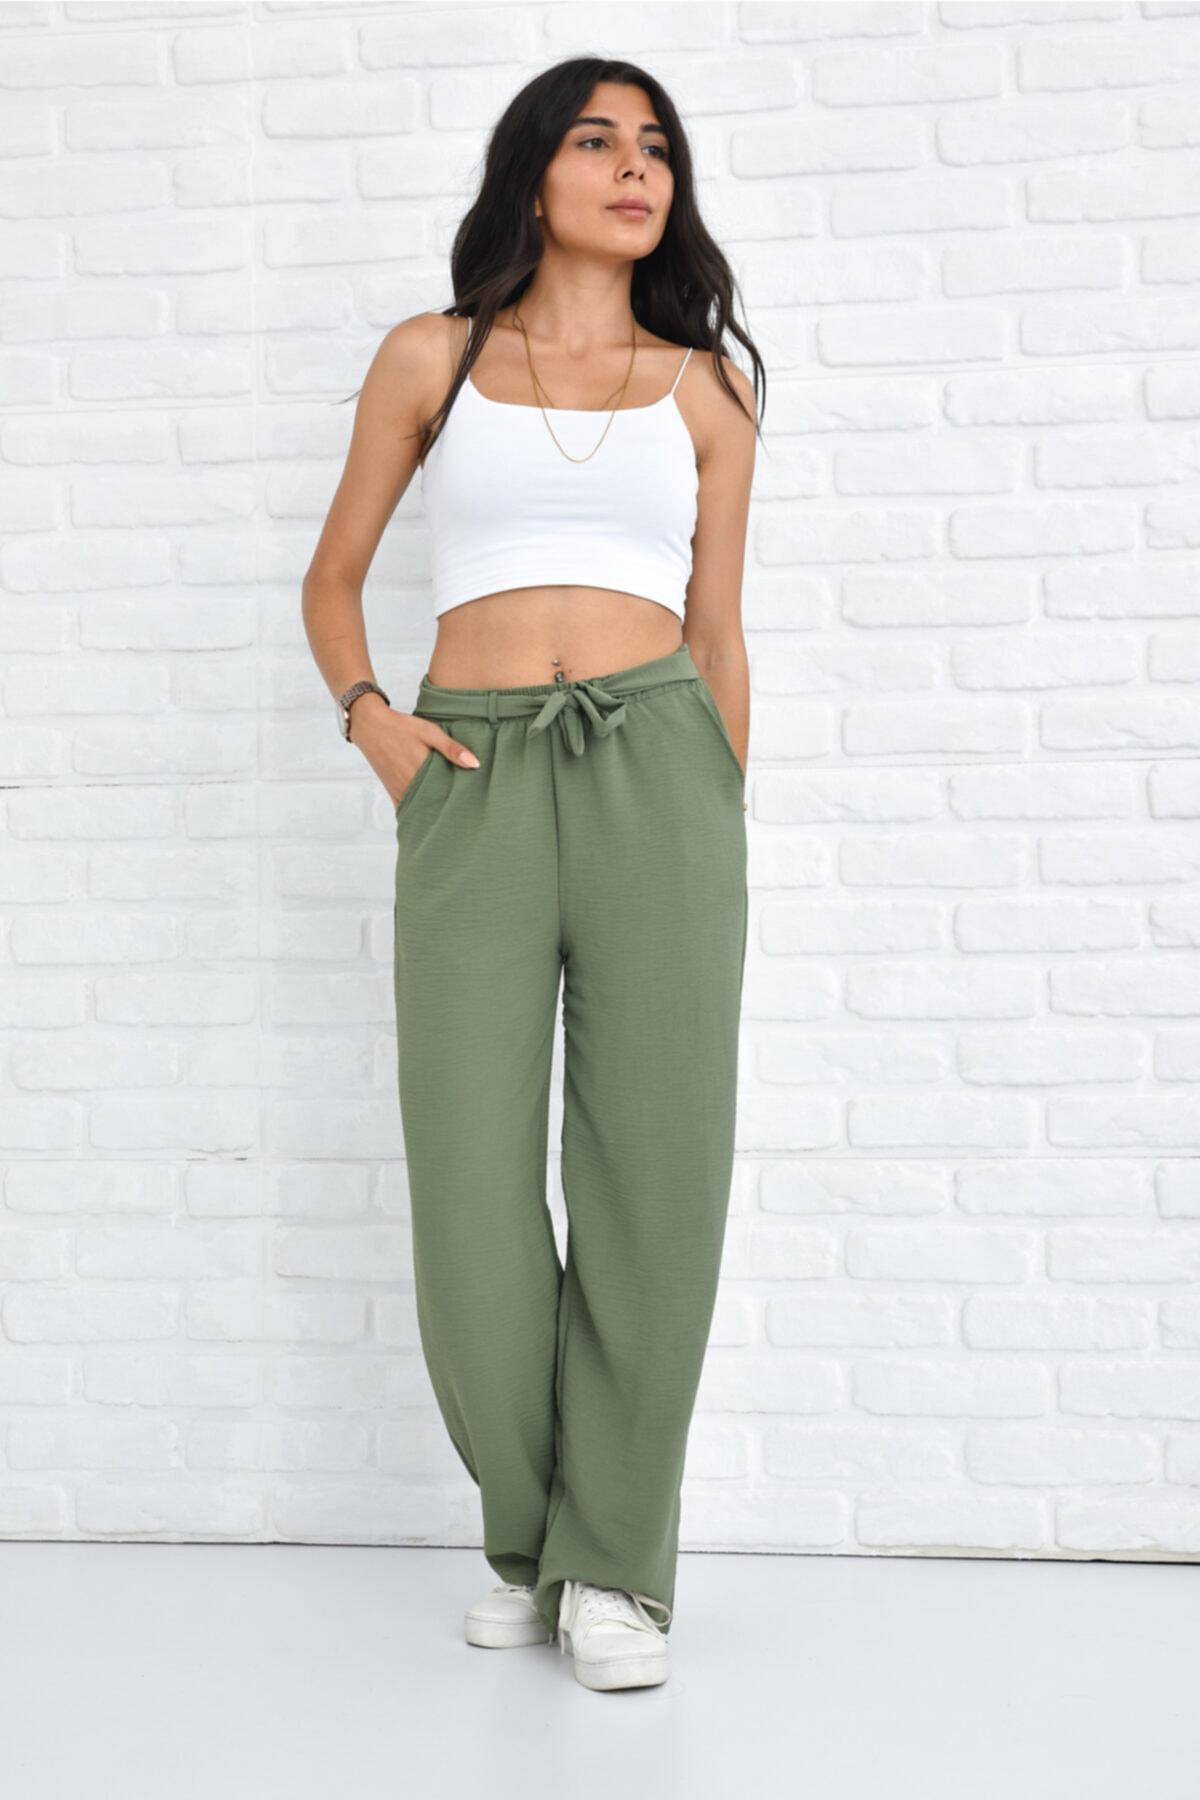 Kadın Haki Palazzo Yazlık Beli Lastikli Bol Paça Tiril Aerobin Pantolon